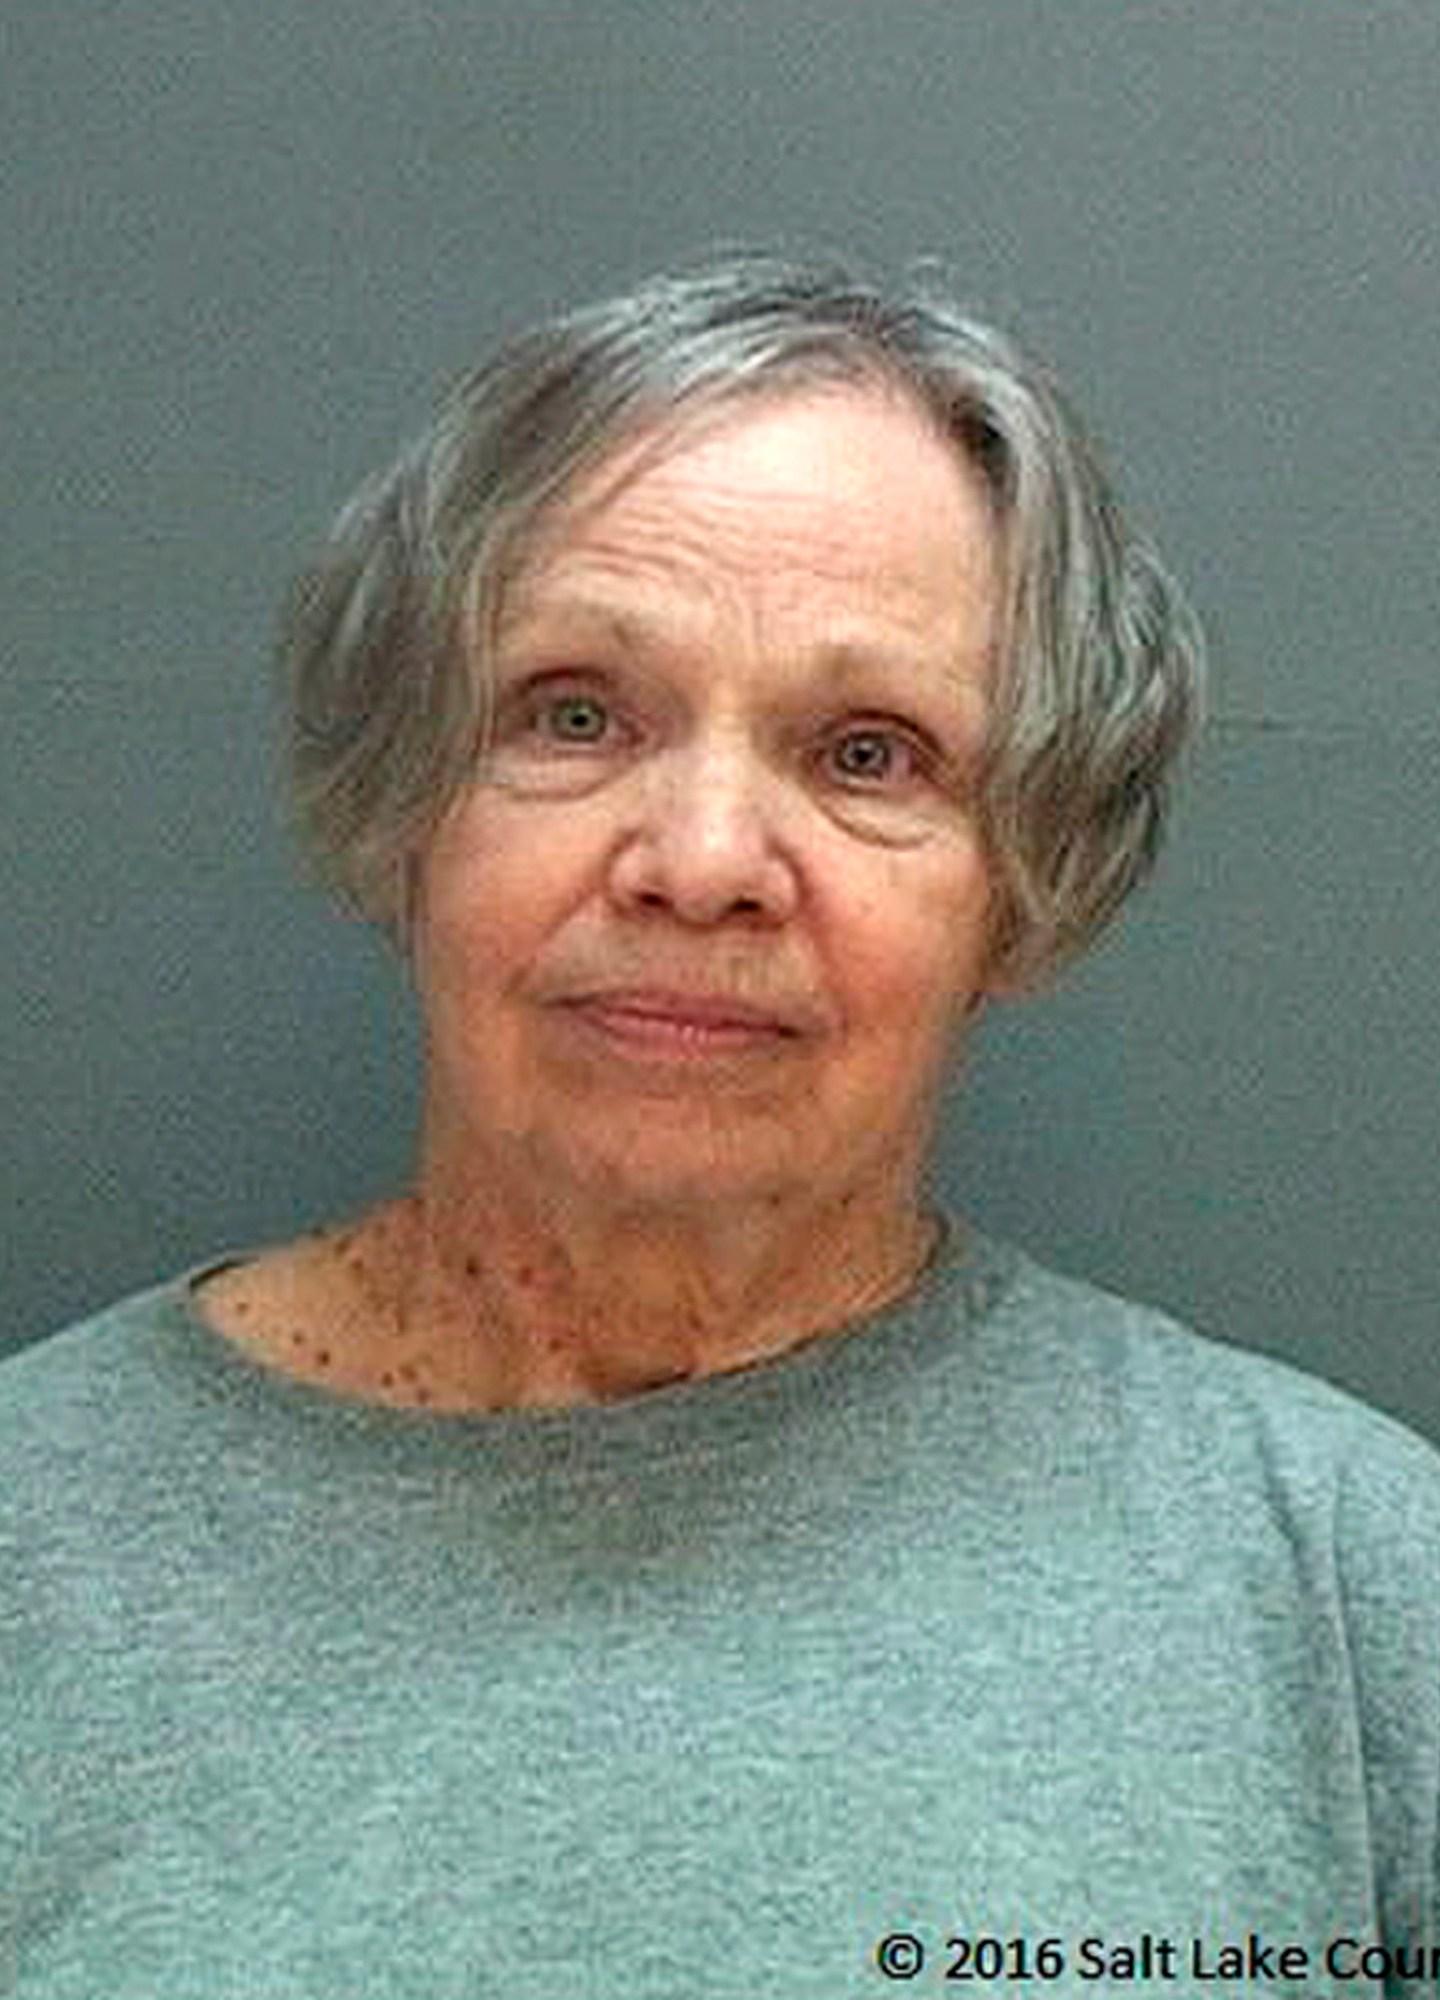 Elizabeth_Smart_Kidnapper_Prison_Release_78084-159532.jpg26634420